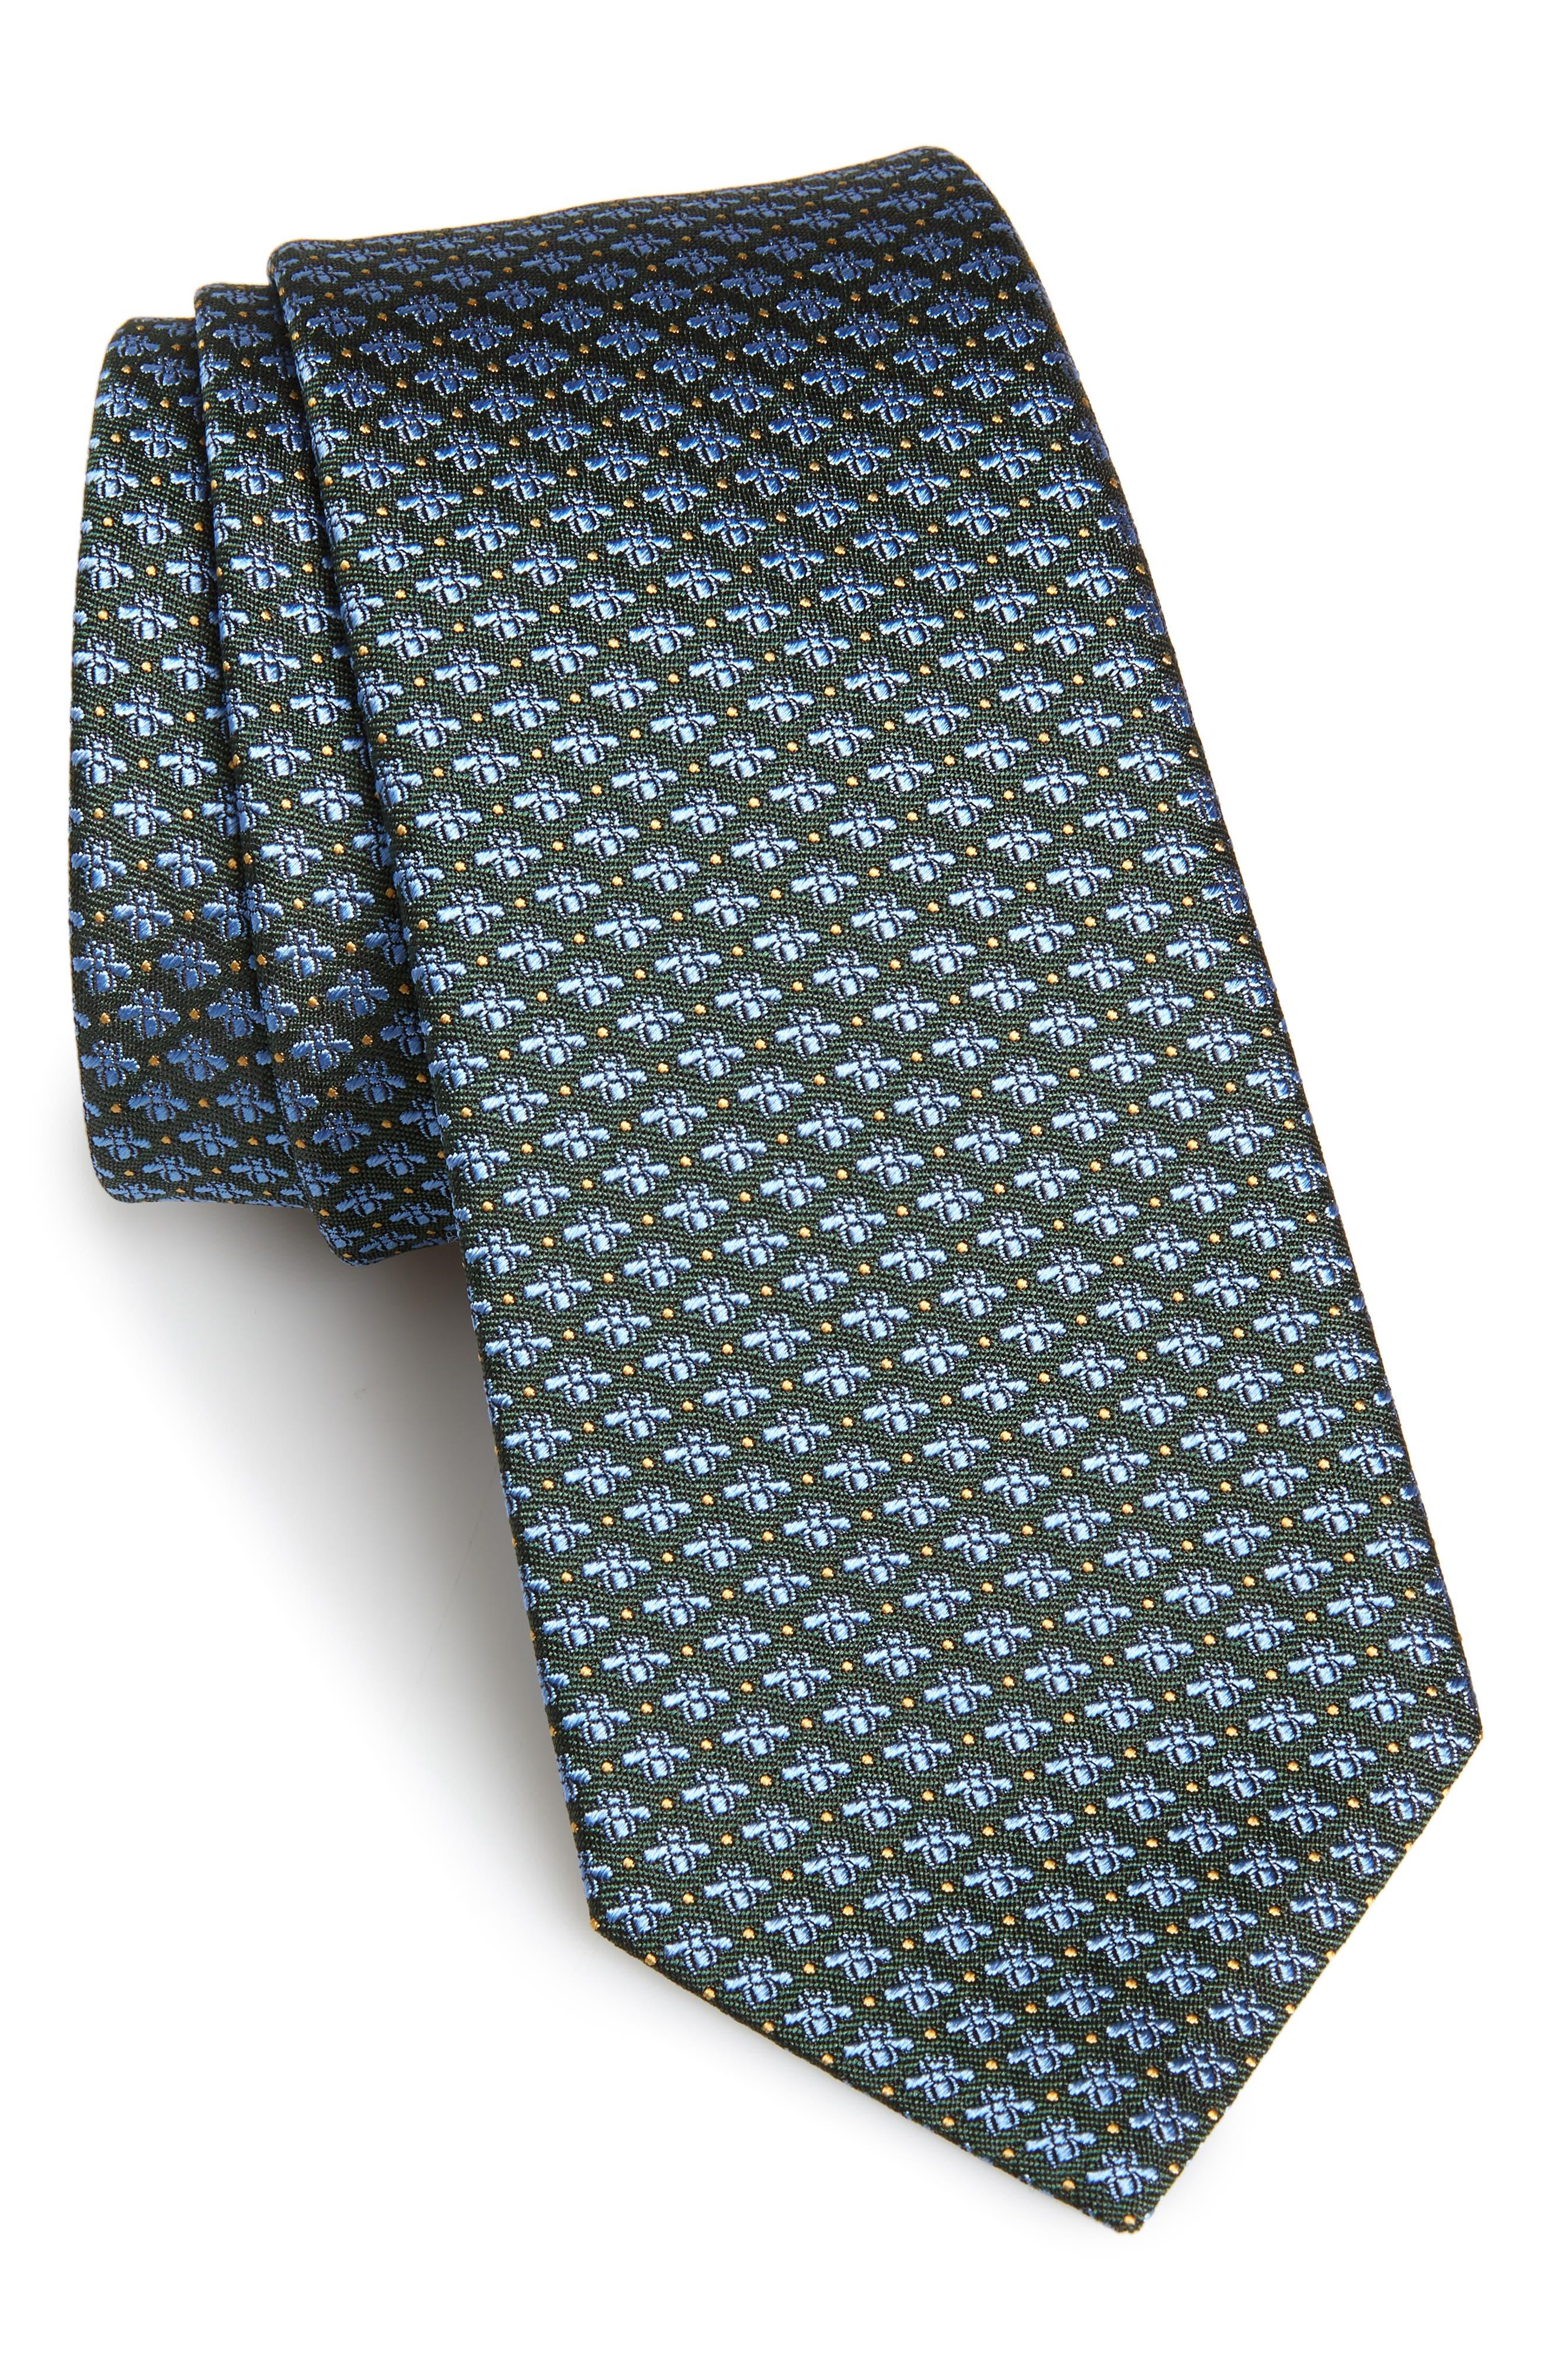 GUCCI 7.0 Woven Silk Tie, Main, color, SAGE